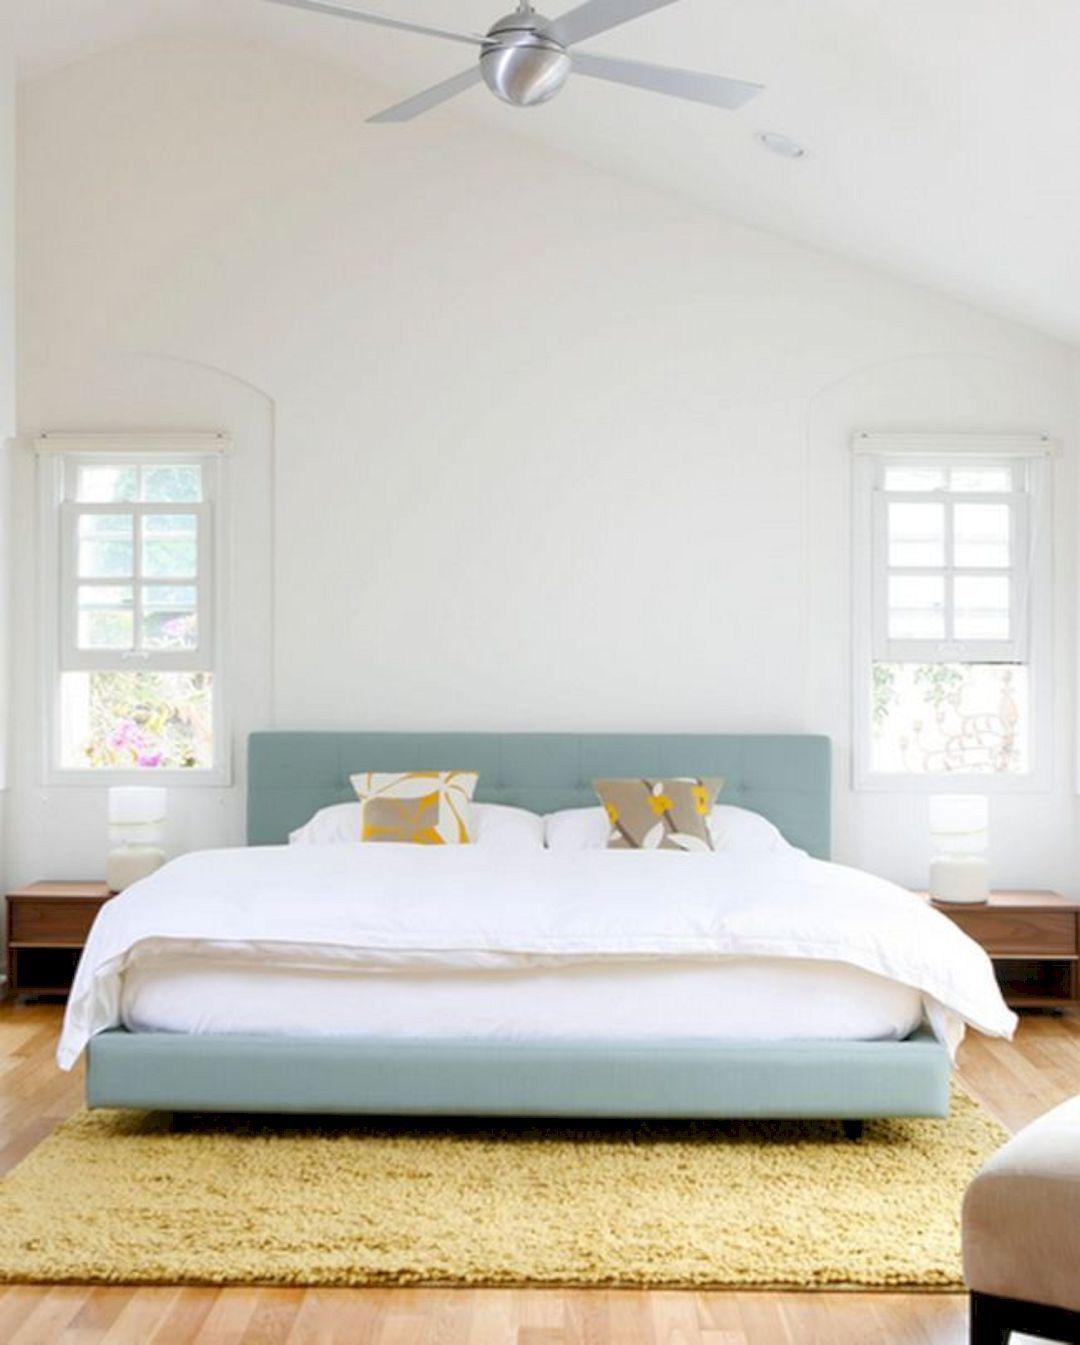 Bedroom Designs On A Budget 15 Minimalist Budget Bedroom Designs  Budget Bedroom Minimalist